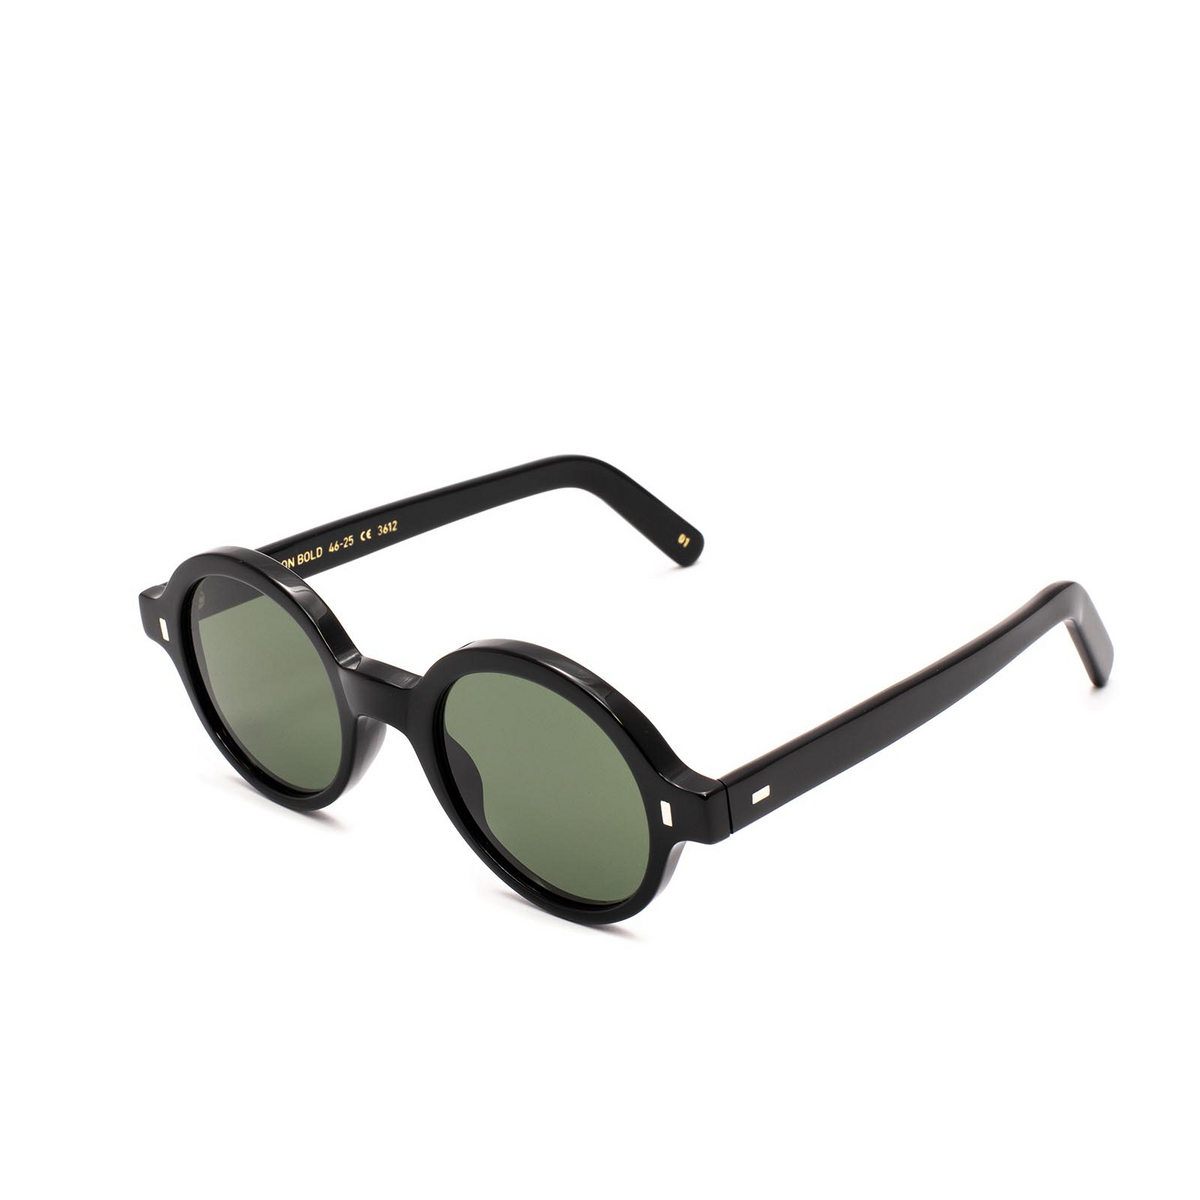 L.G.R® Round Sunglasses: Reunion Bold color Black 01.